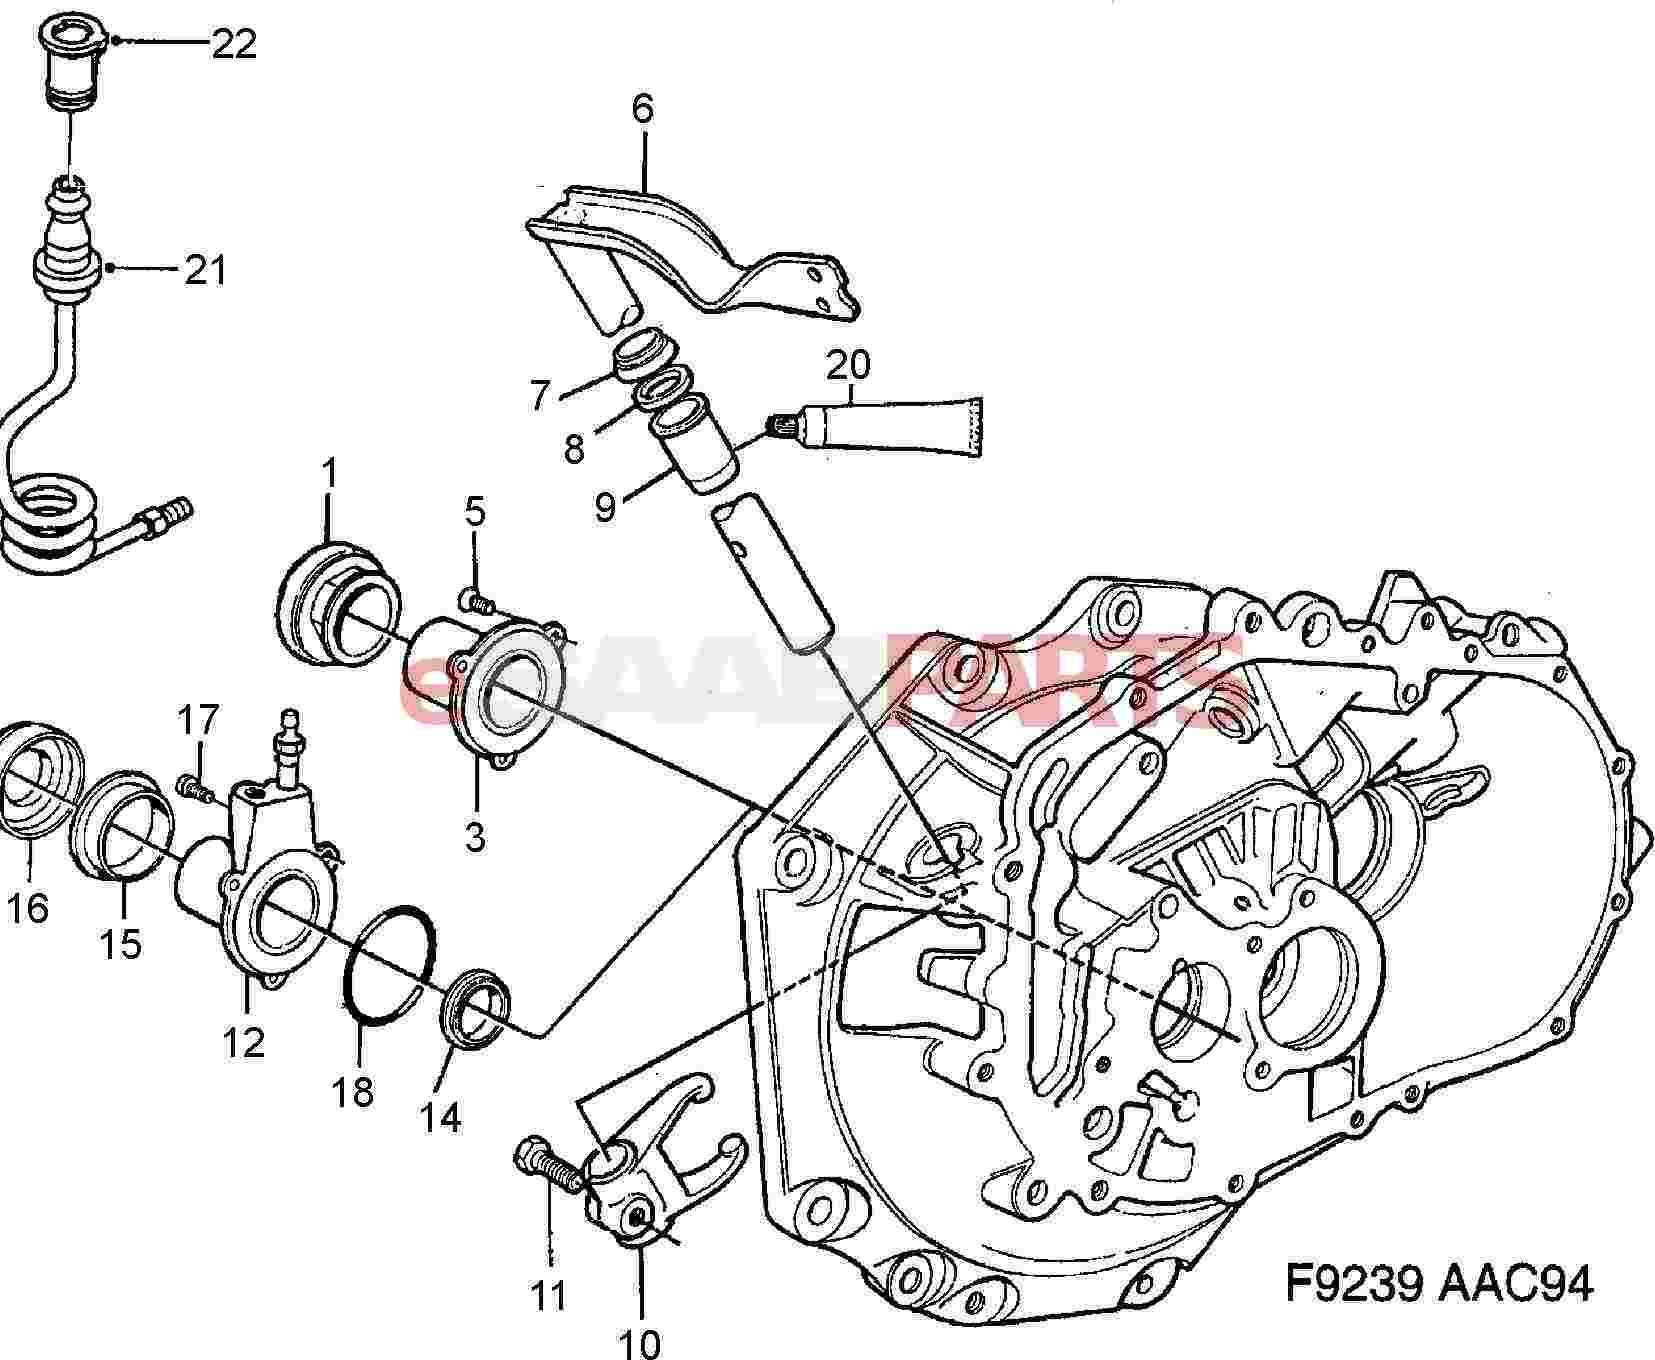 saab 900 transmission diagram wiring diagrams text Mazda Rx7 Transmission Diagram